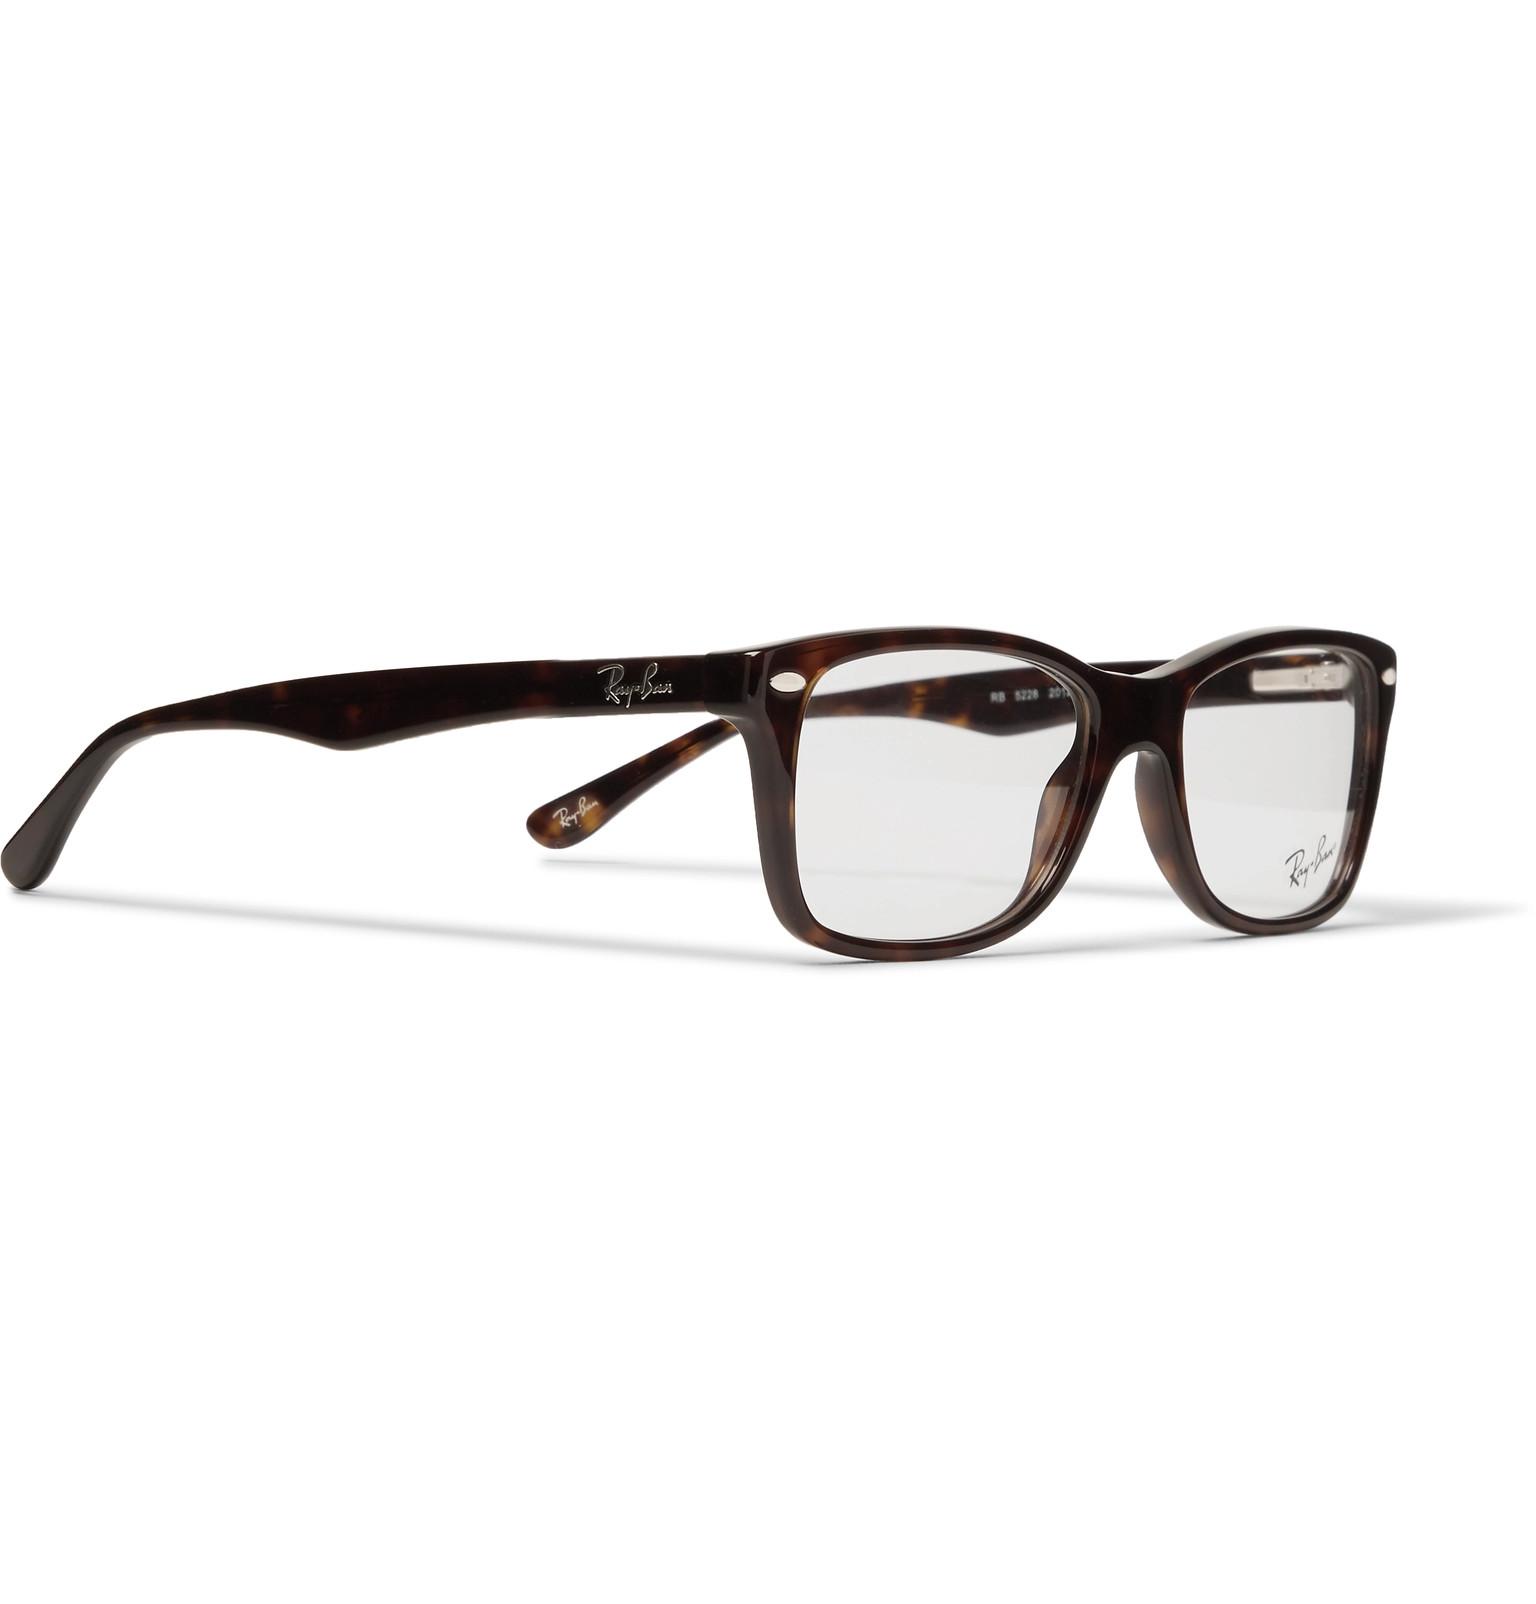 f5264c5b2a Ray-Ban - Square-Frame Tortoiseshell Acetate Optical Glasses